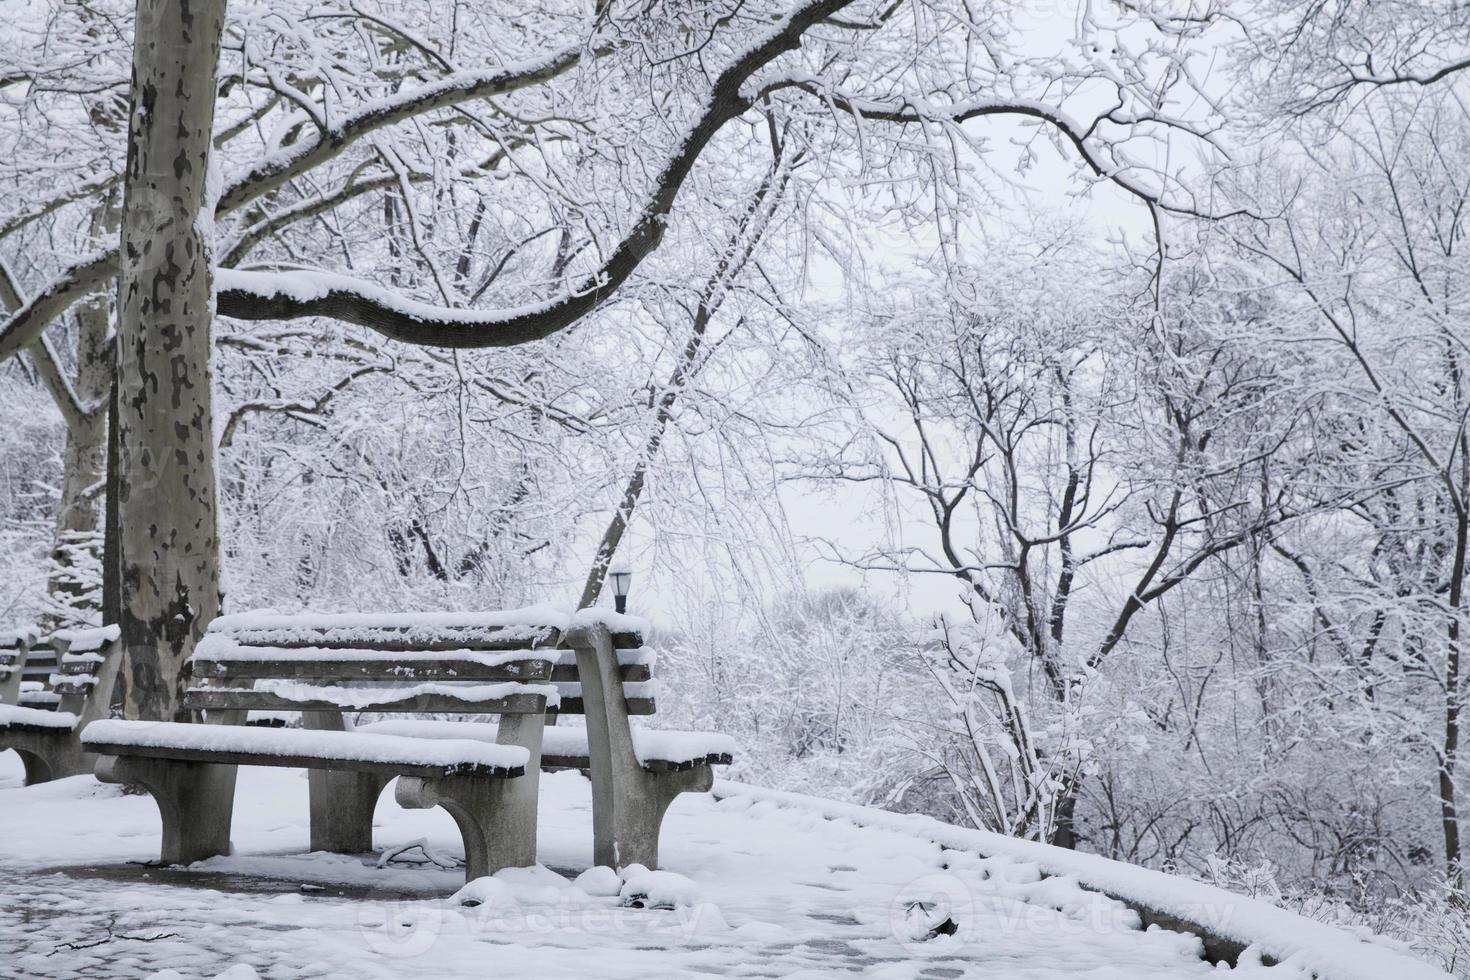 Winter scene at New York City photo